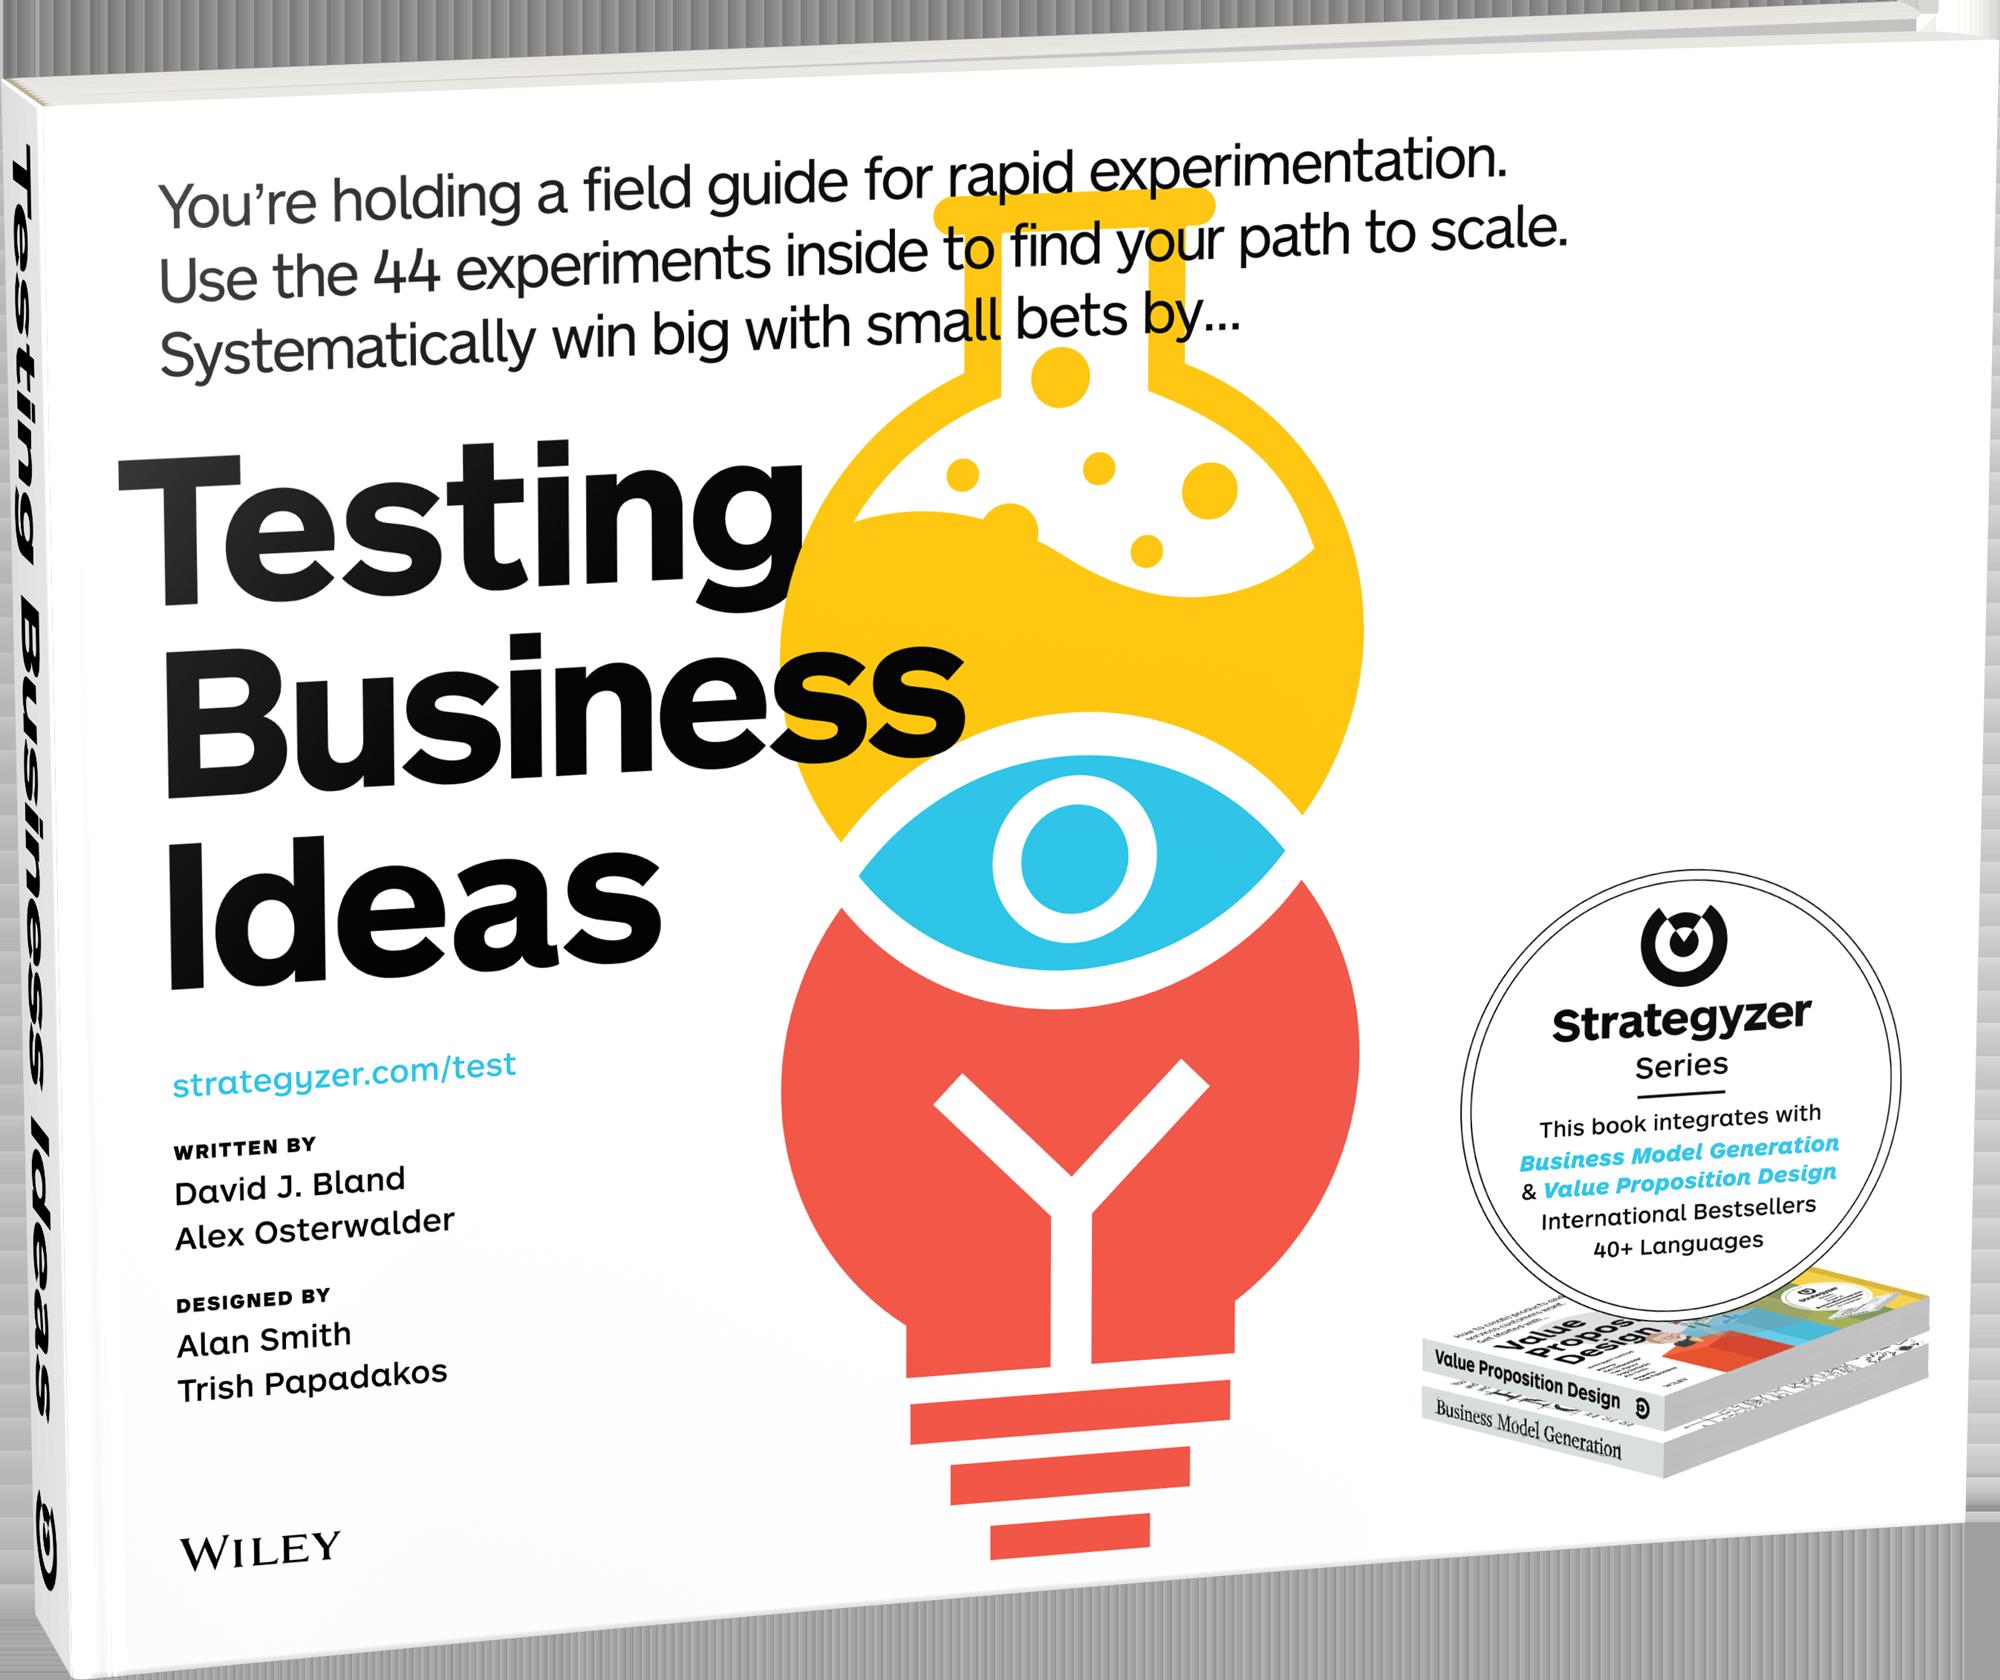 Strategyzer | Testing Business Ideas - Process to Reduce ...